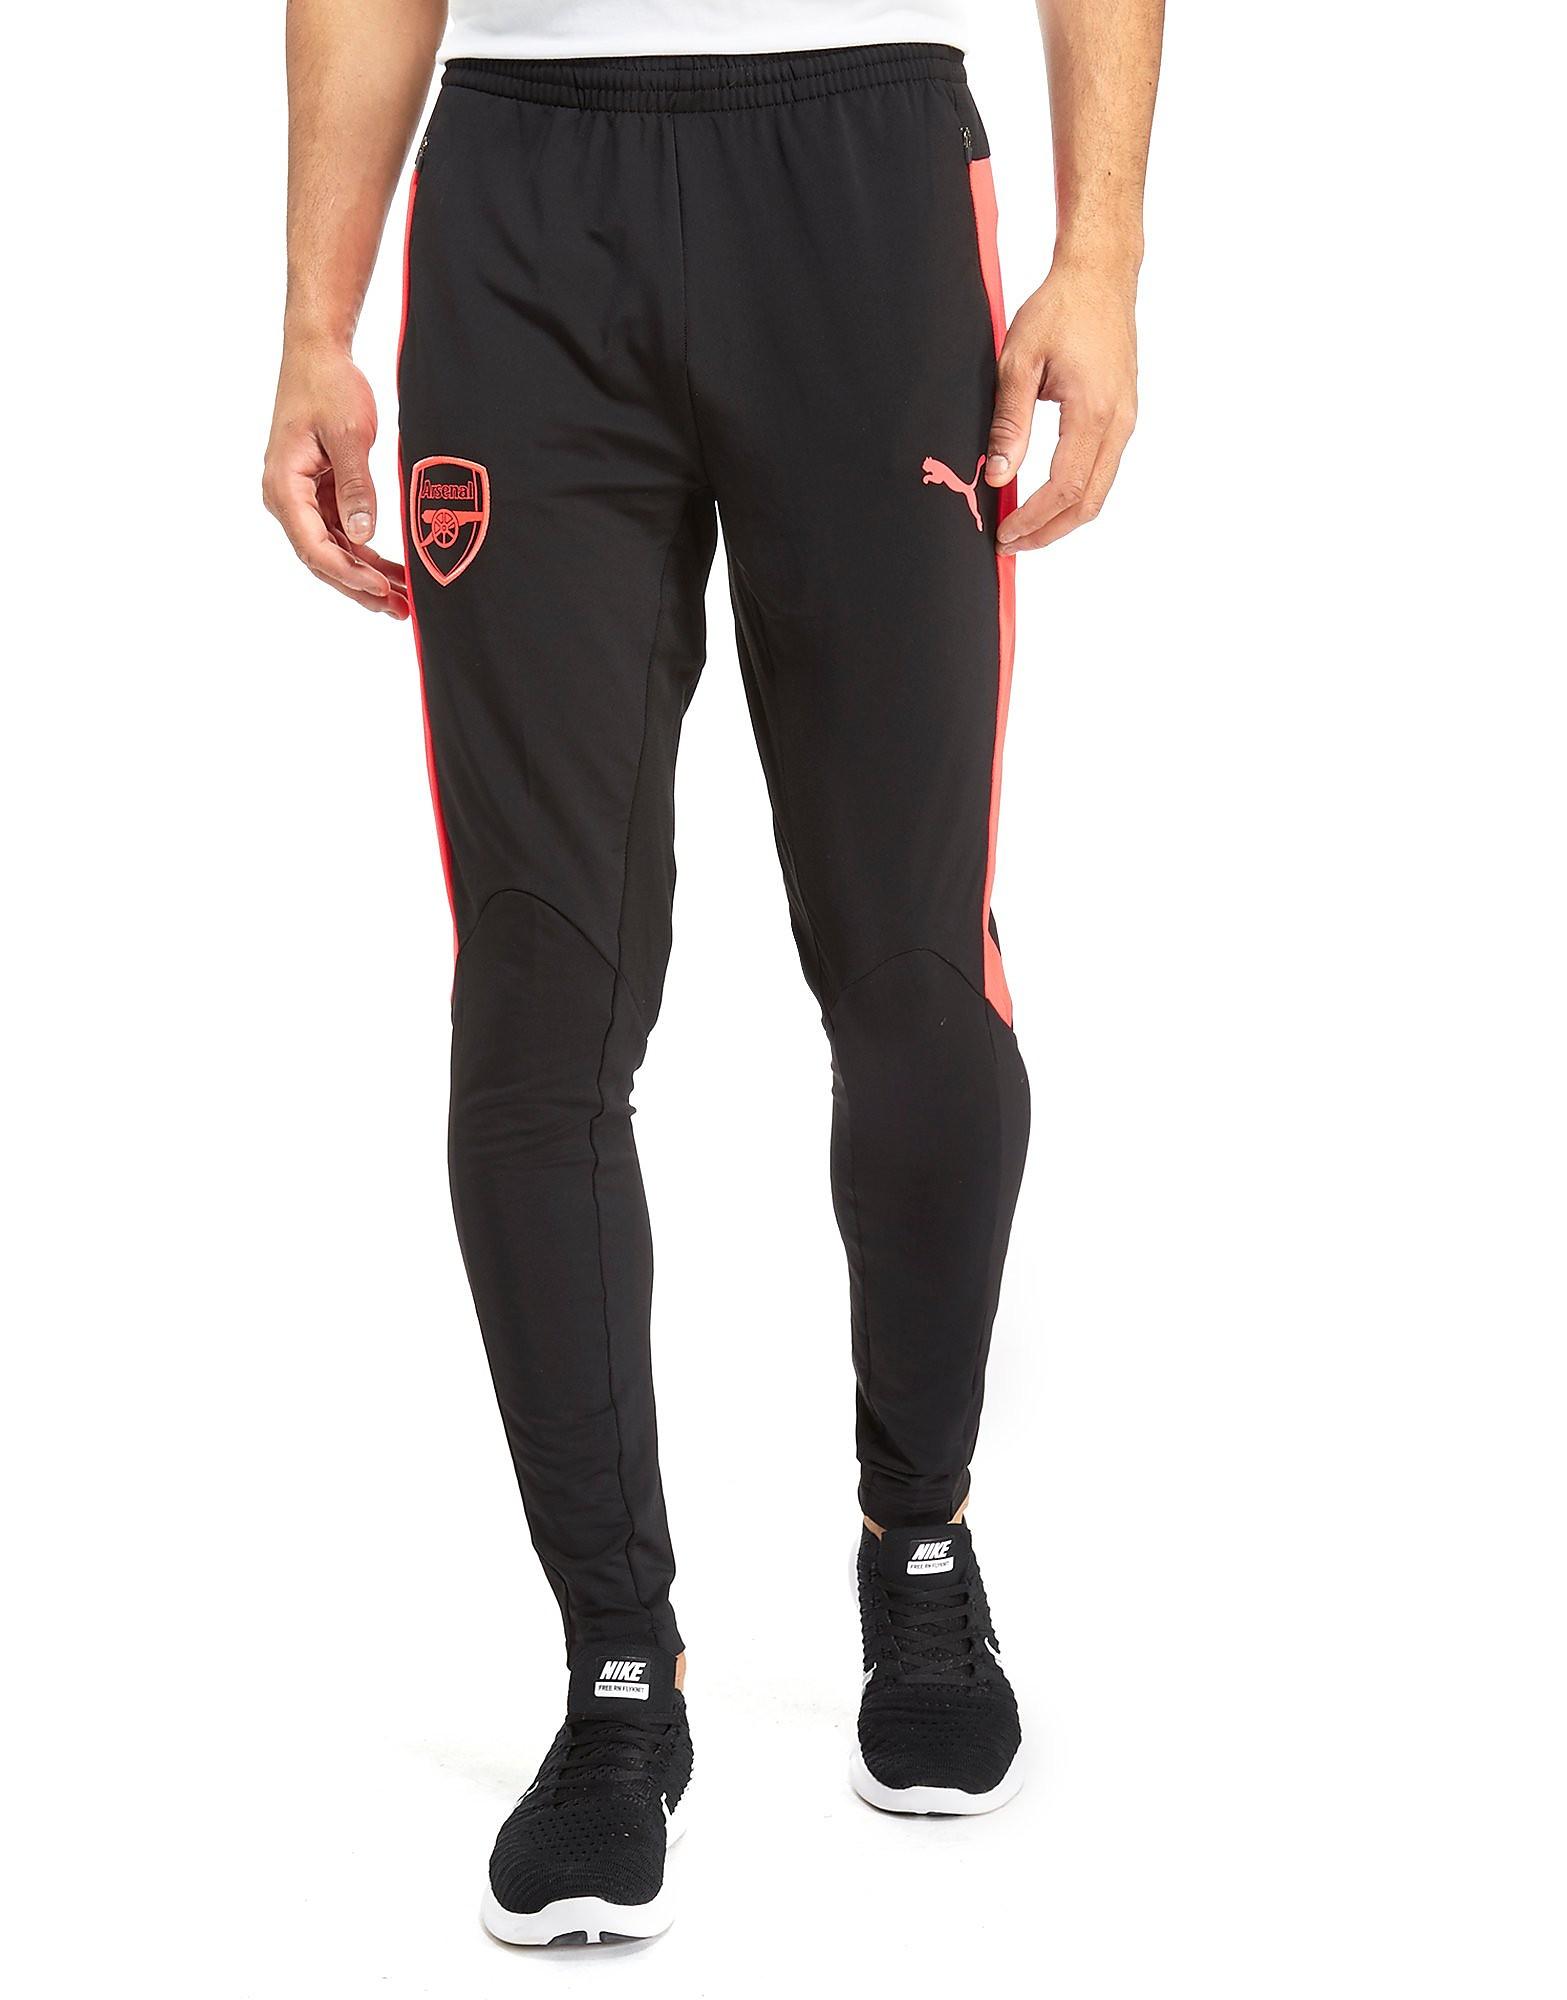 PUMA Arsenal 2017 Training Pants